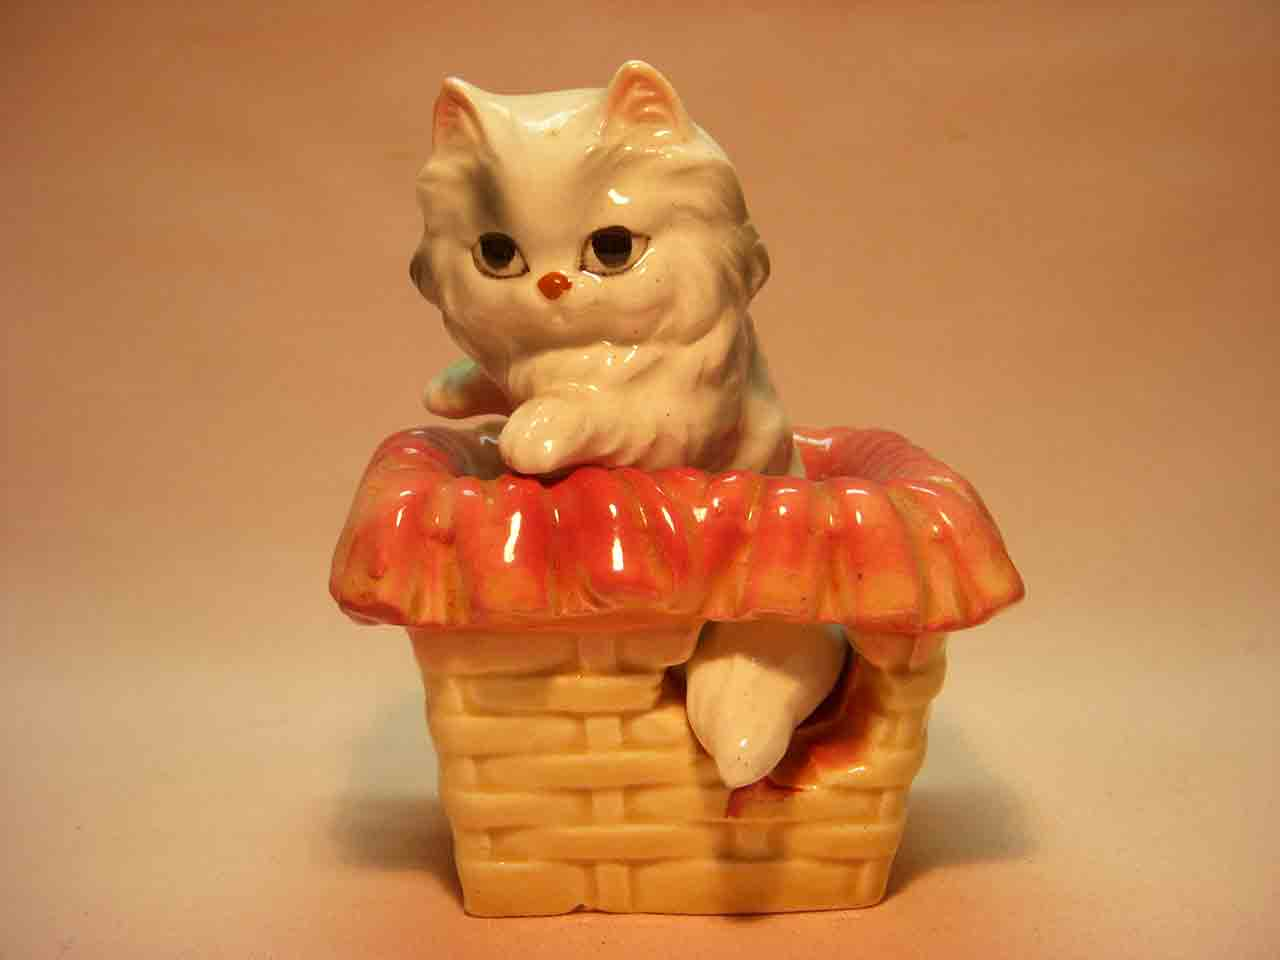 Nester cat sitting inside a basket salt and pepper shaker